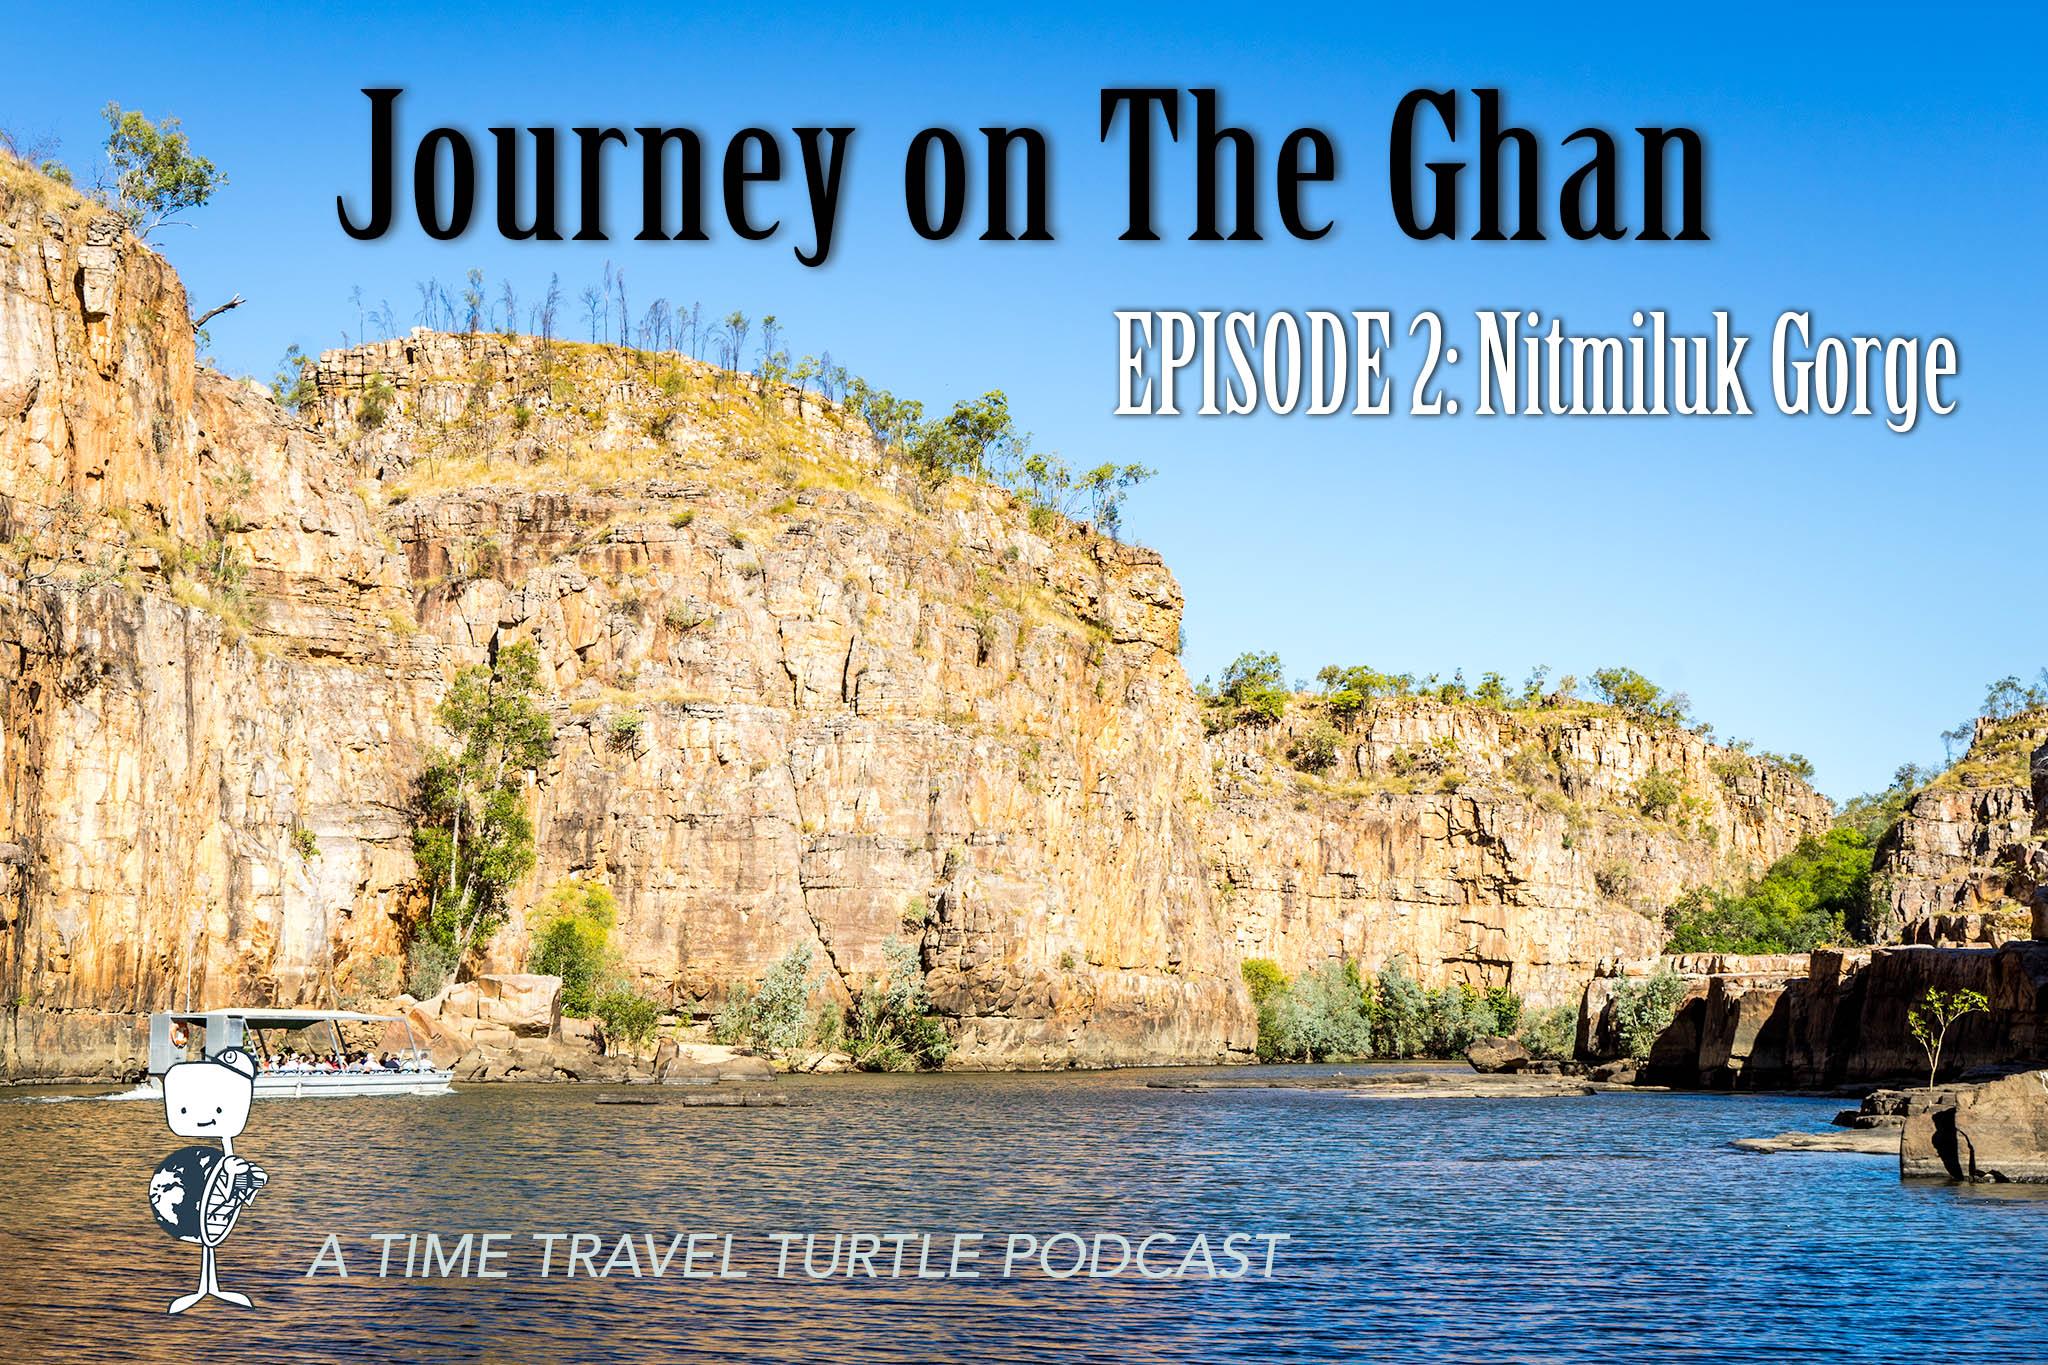 Episode 2: Nitmiluk Gorge